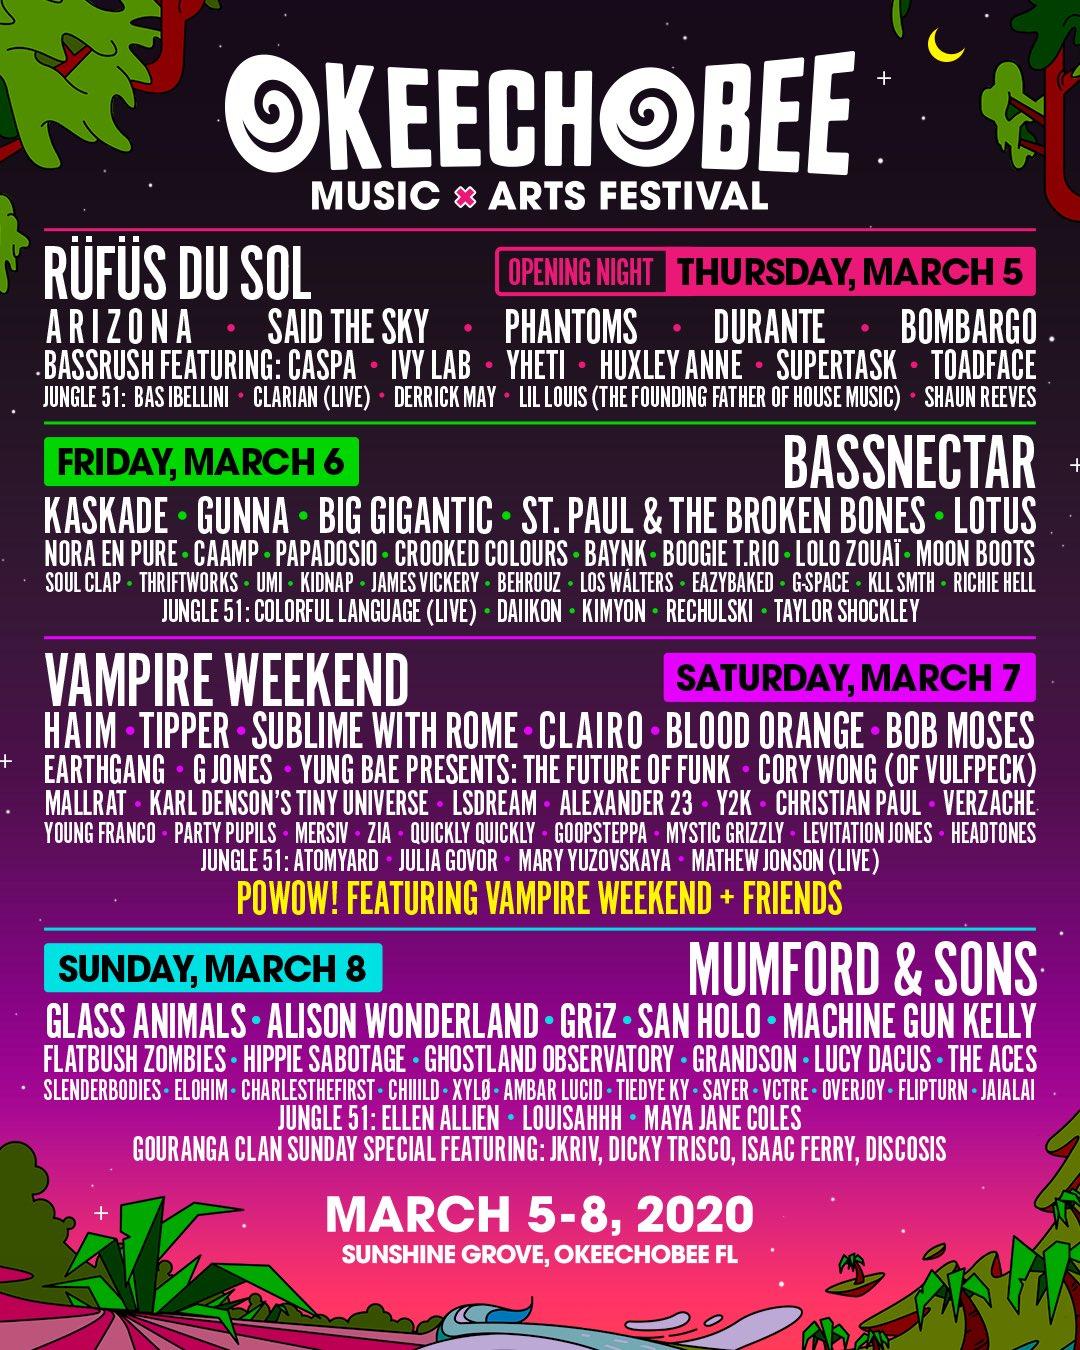 okeechobee festival lineup 2020